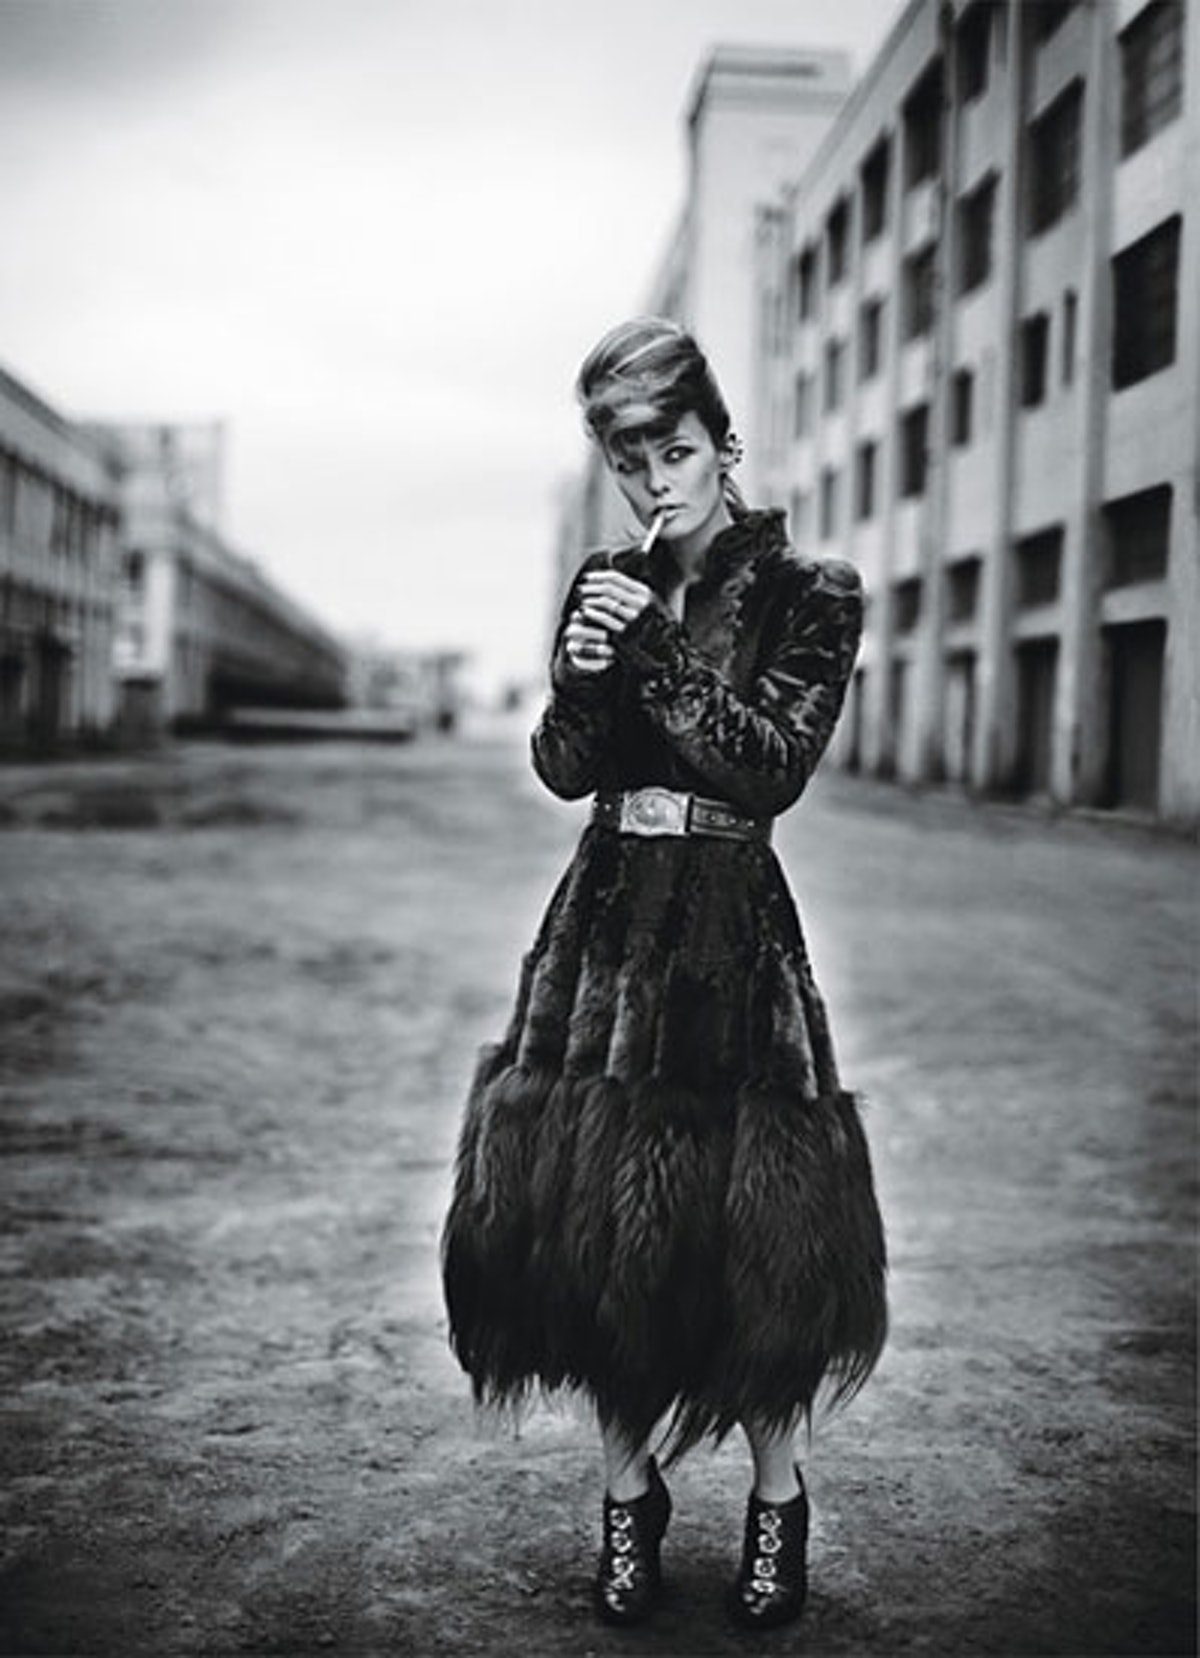 fass-new-fashion-photographers-03-v.jpg